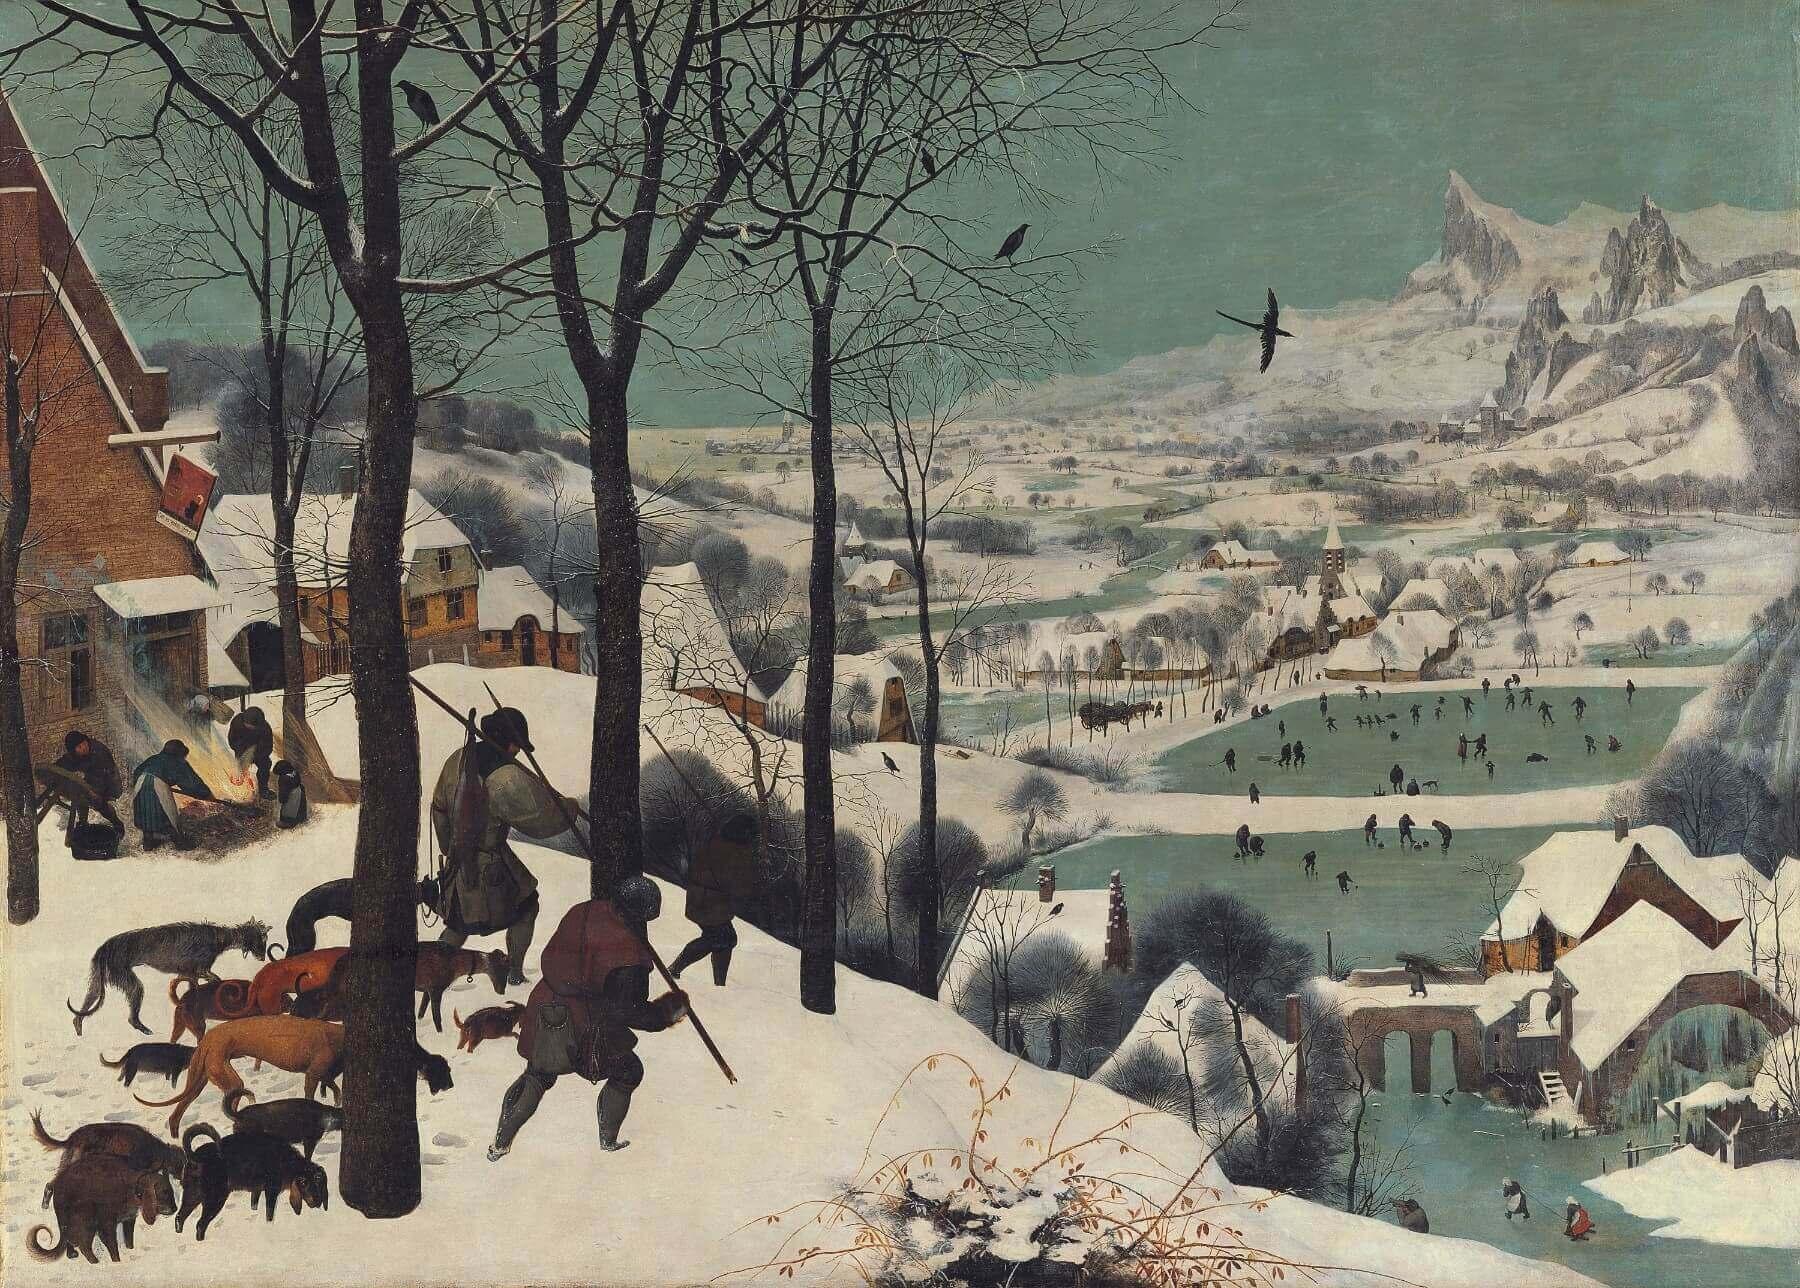 Питер Брейгель, 1565 год, картина «Охотники на снегу».